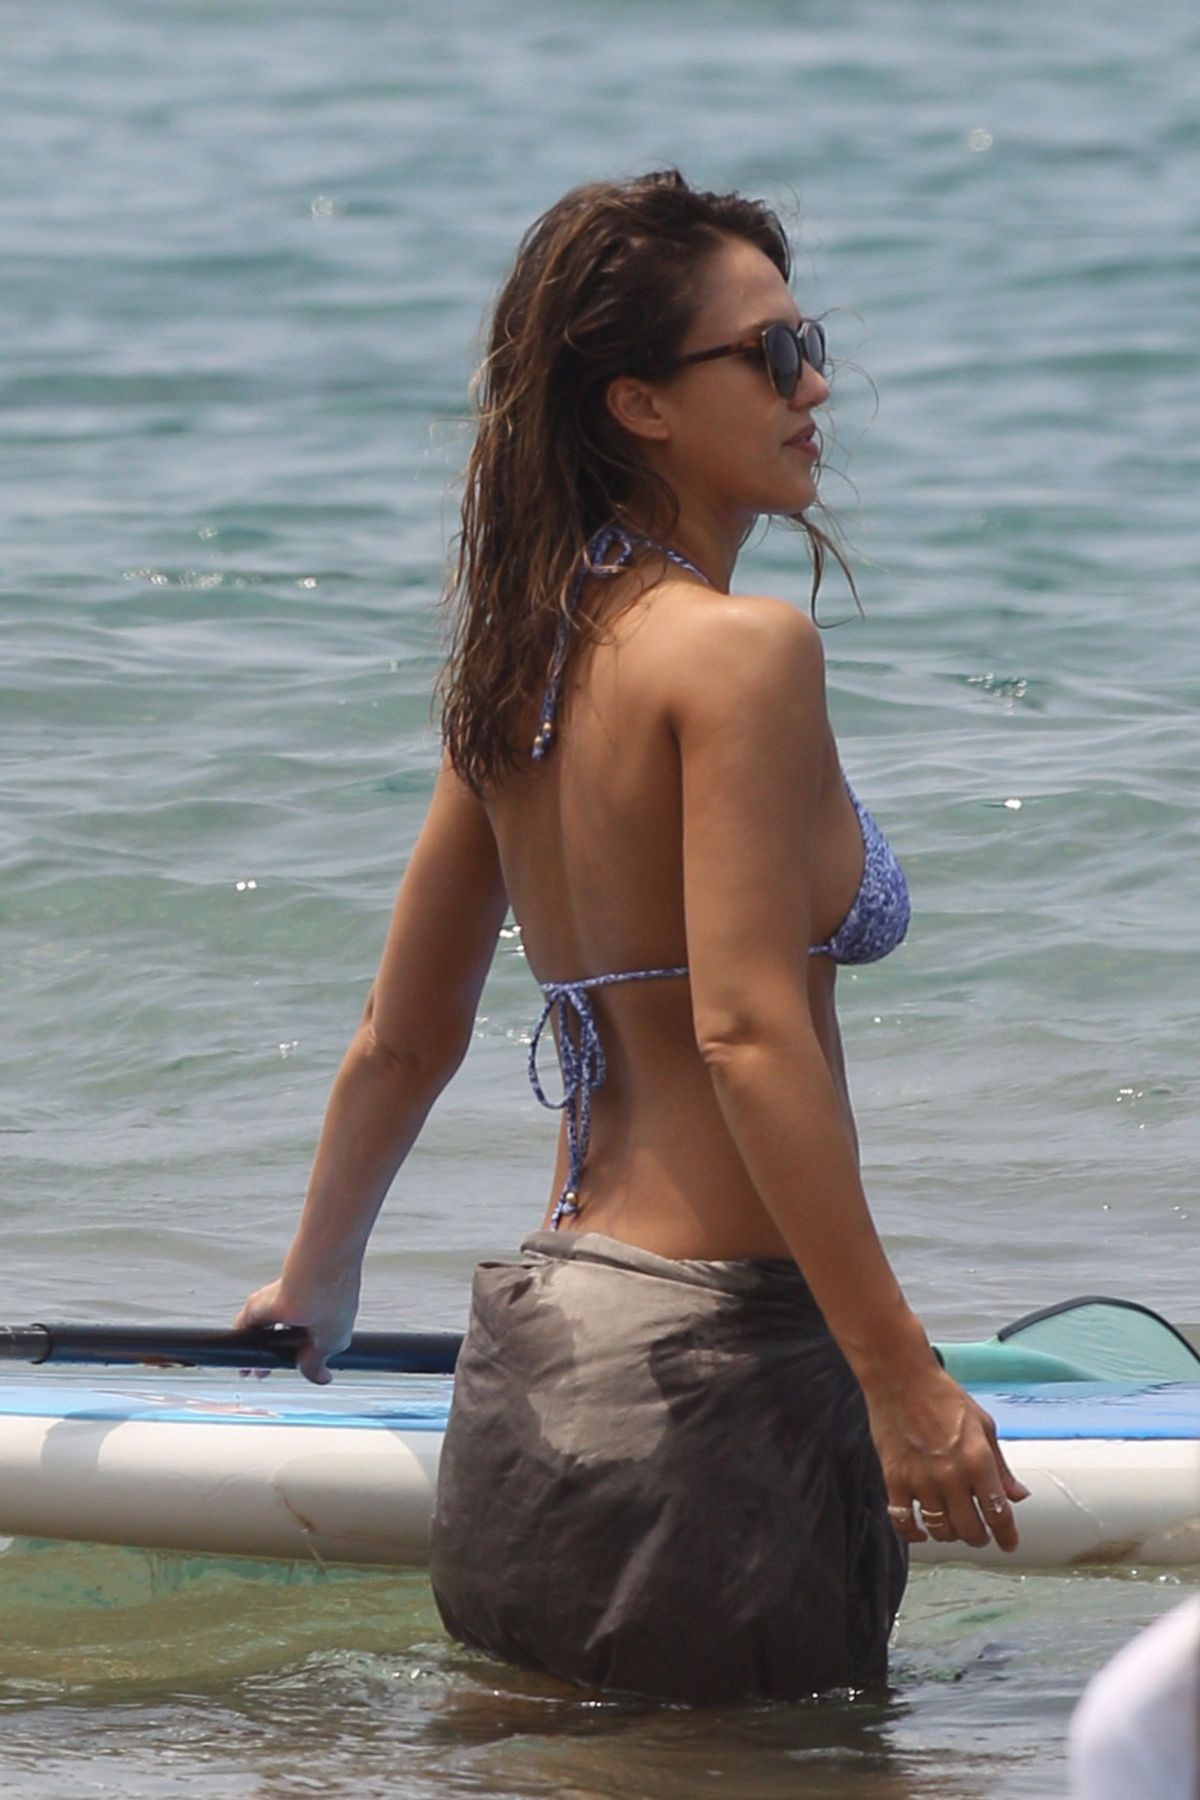 Good bye cellulite hello bikini challenge